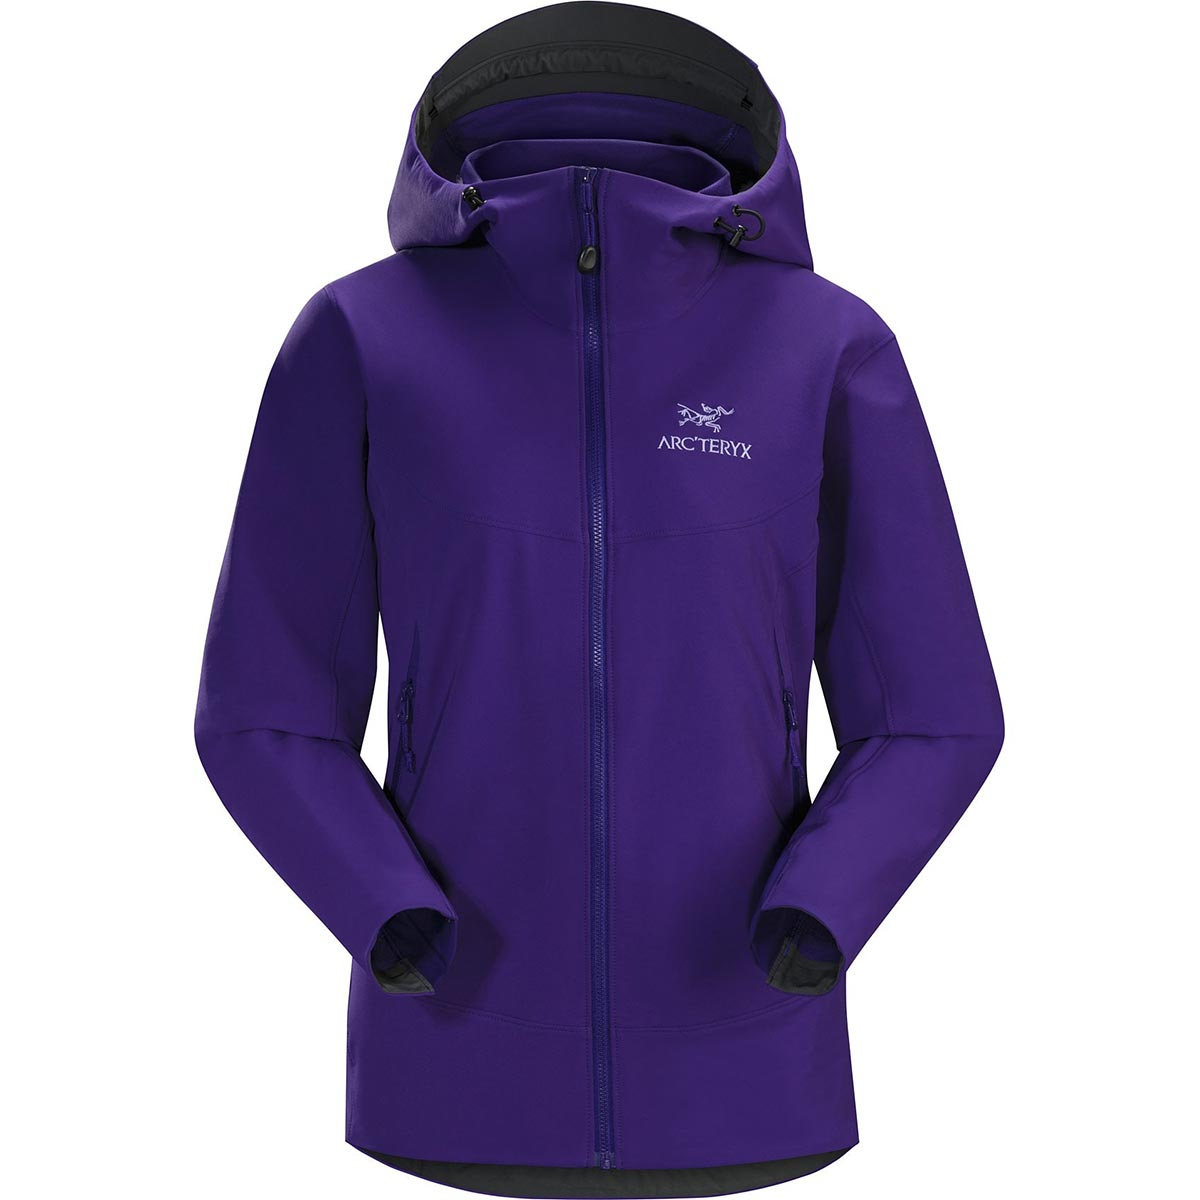 Gamma LT Hoody, women's, discontinued Fall 2018 colors